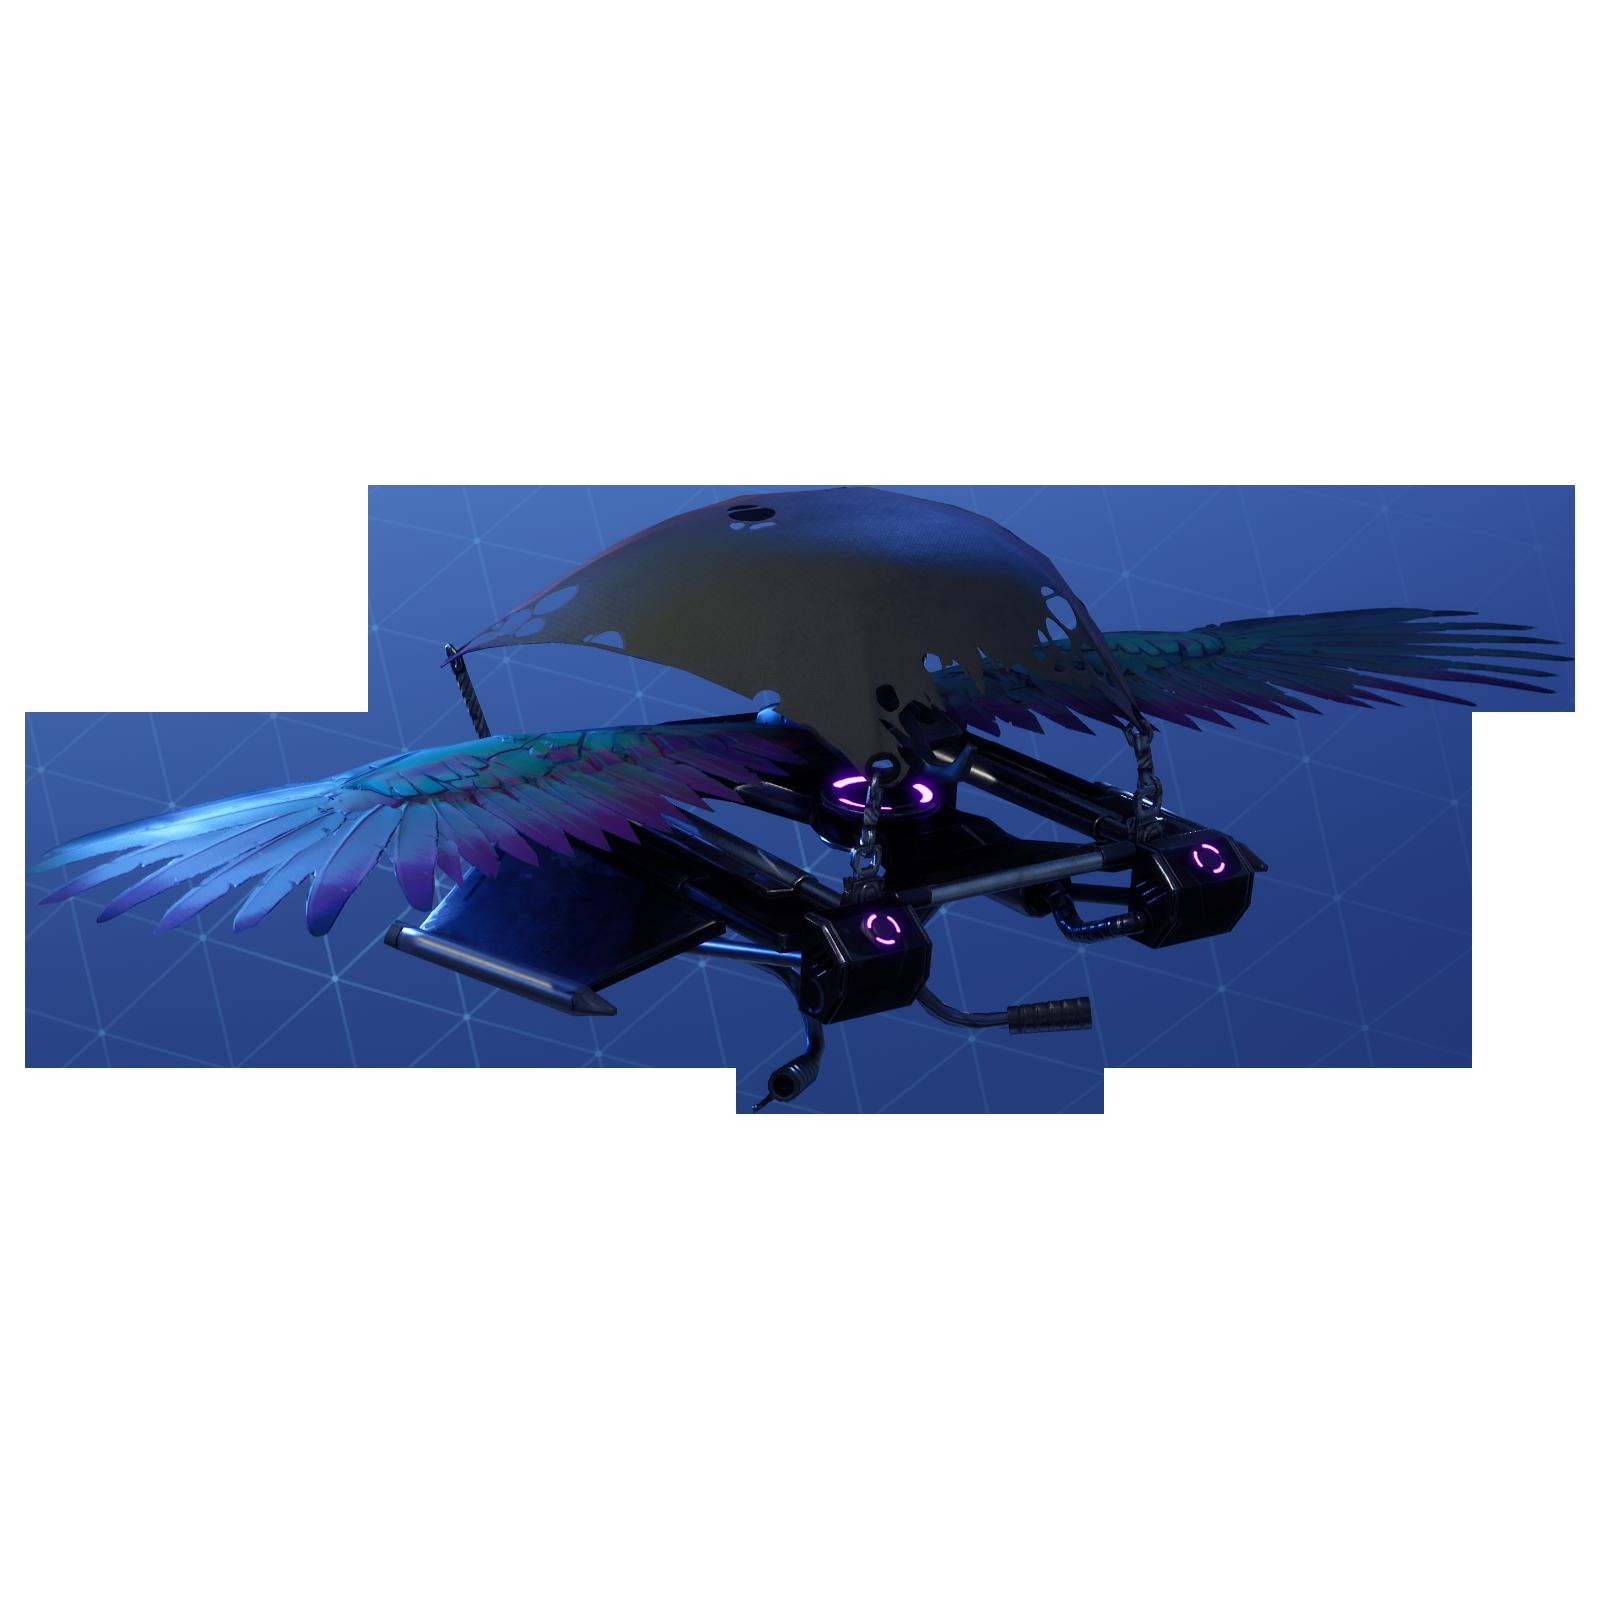 Fortnite Feathered Flyer Png Image Fortnite Game Artwork Gliders